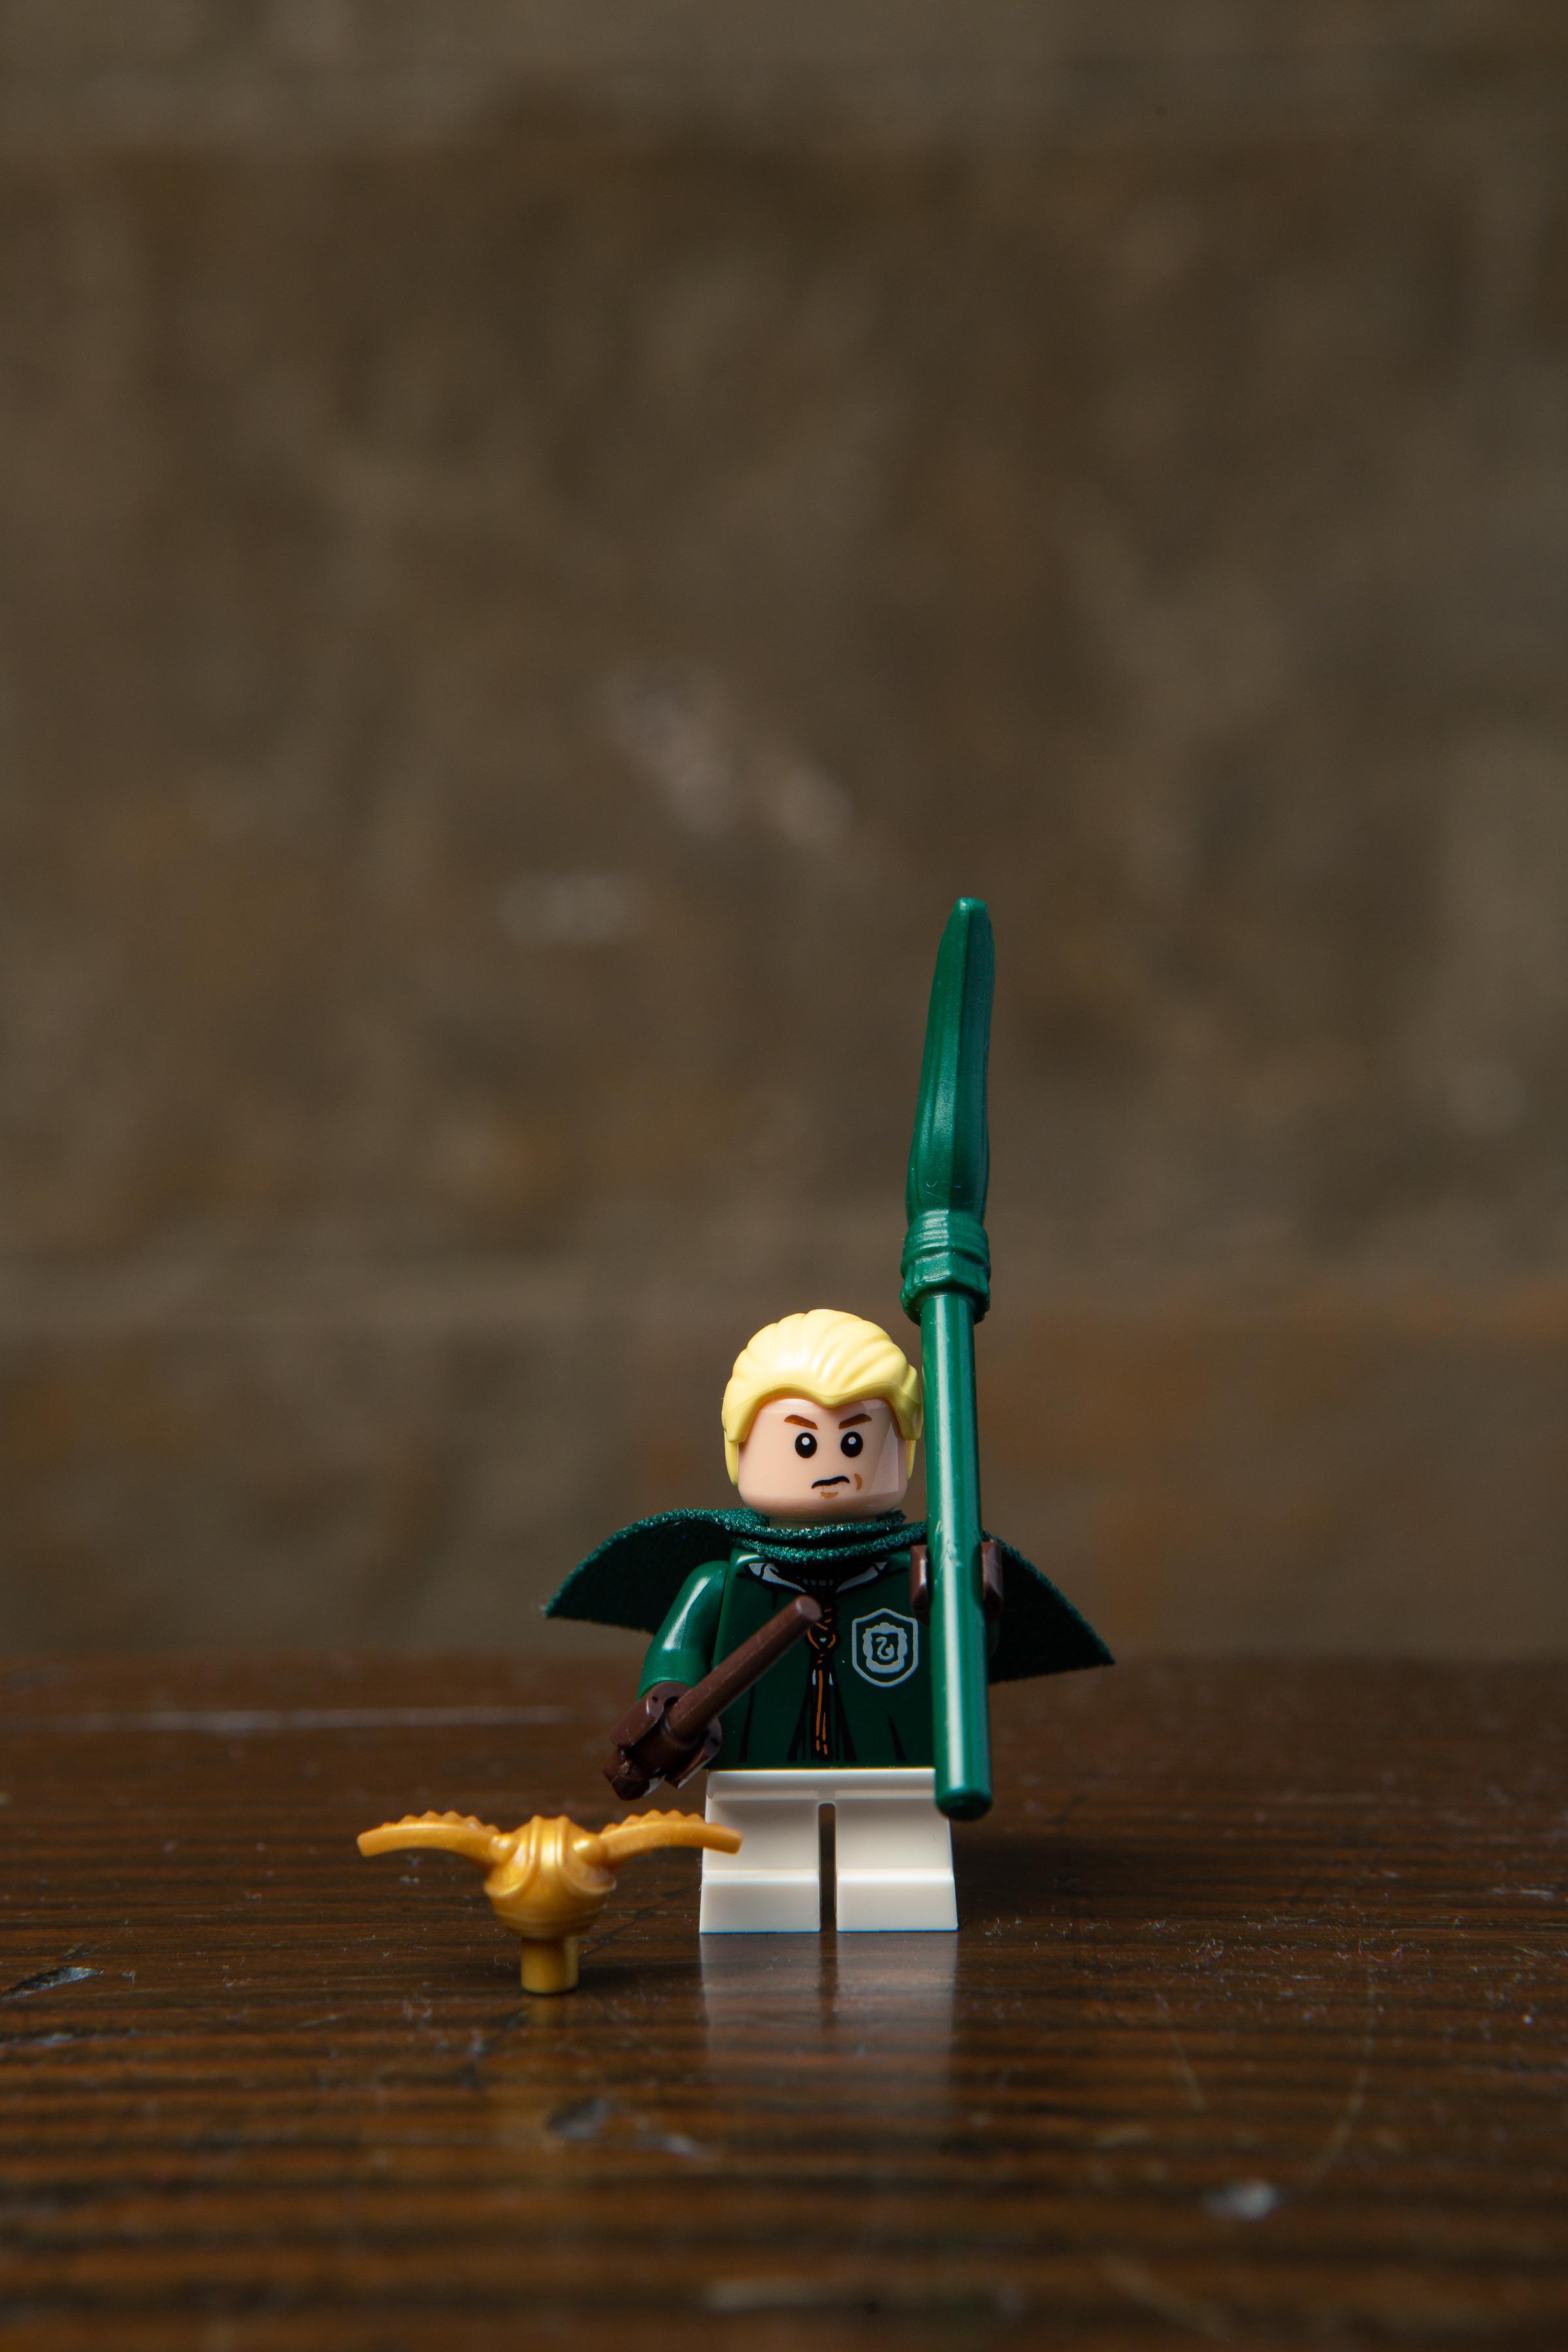 LEGO_WBST_19.06.18_hi-res-24.jpg